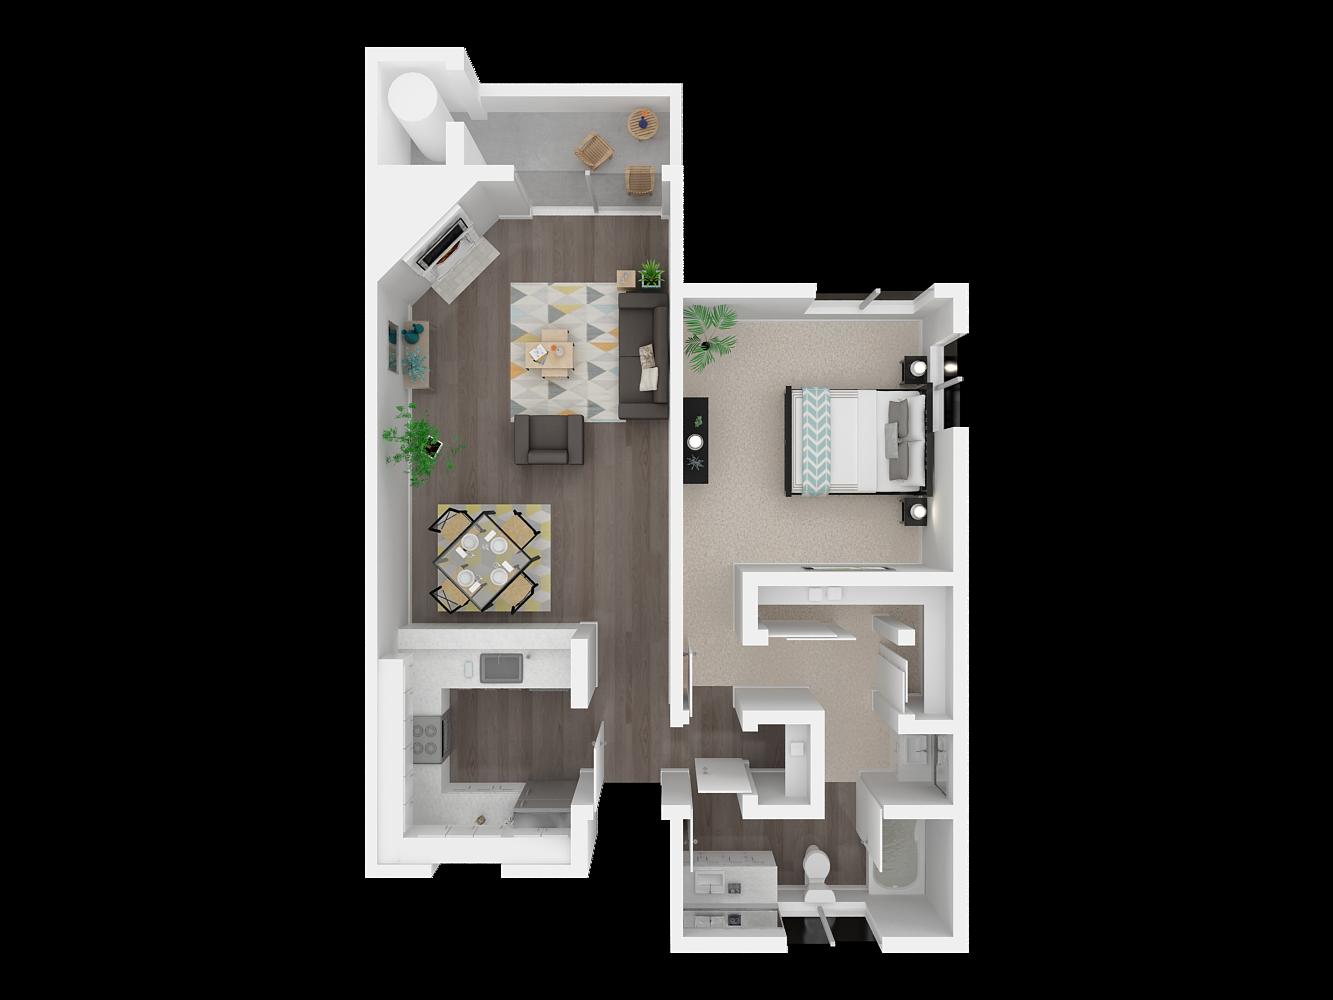 View Floor Plans of Ellington Apartments in Davis, CA